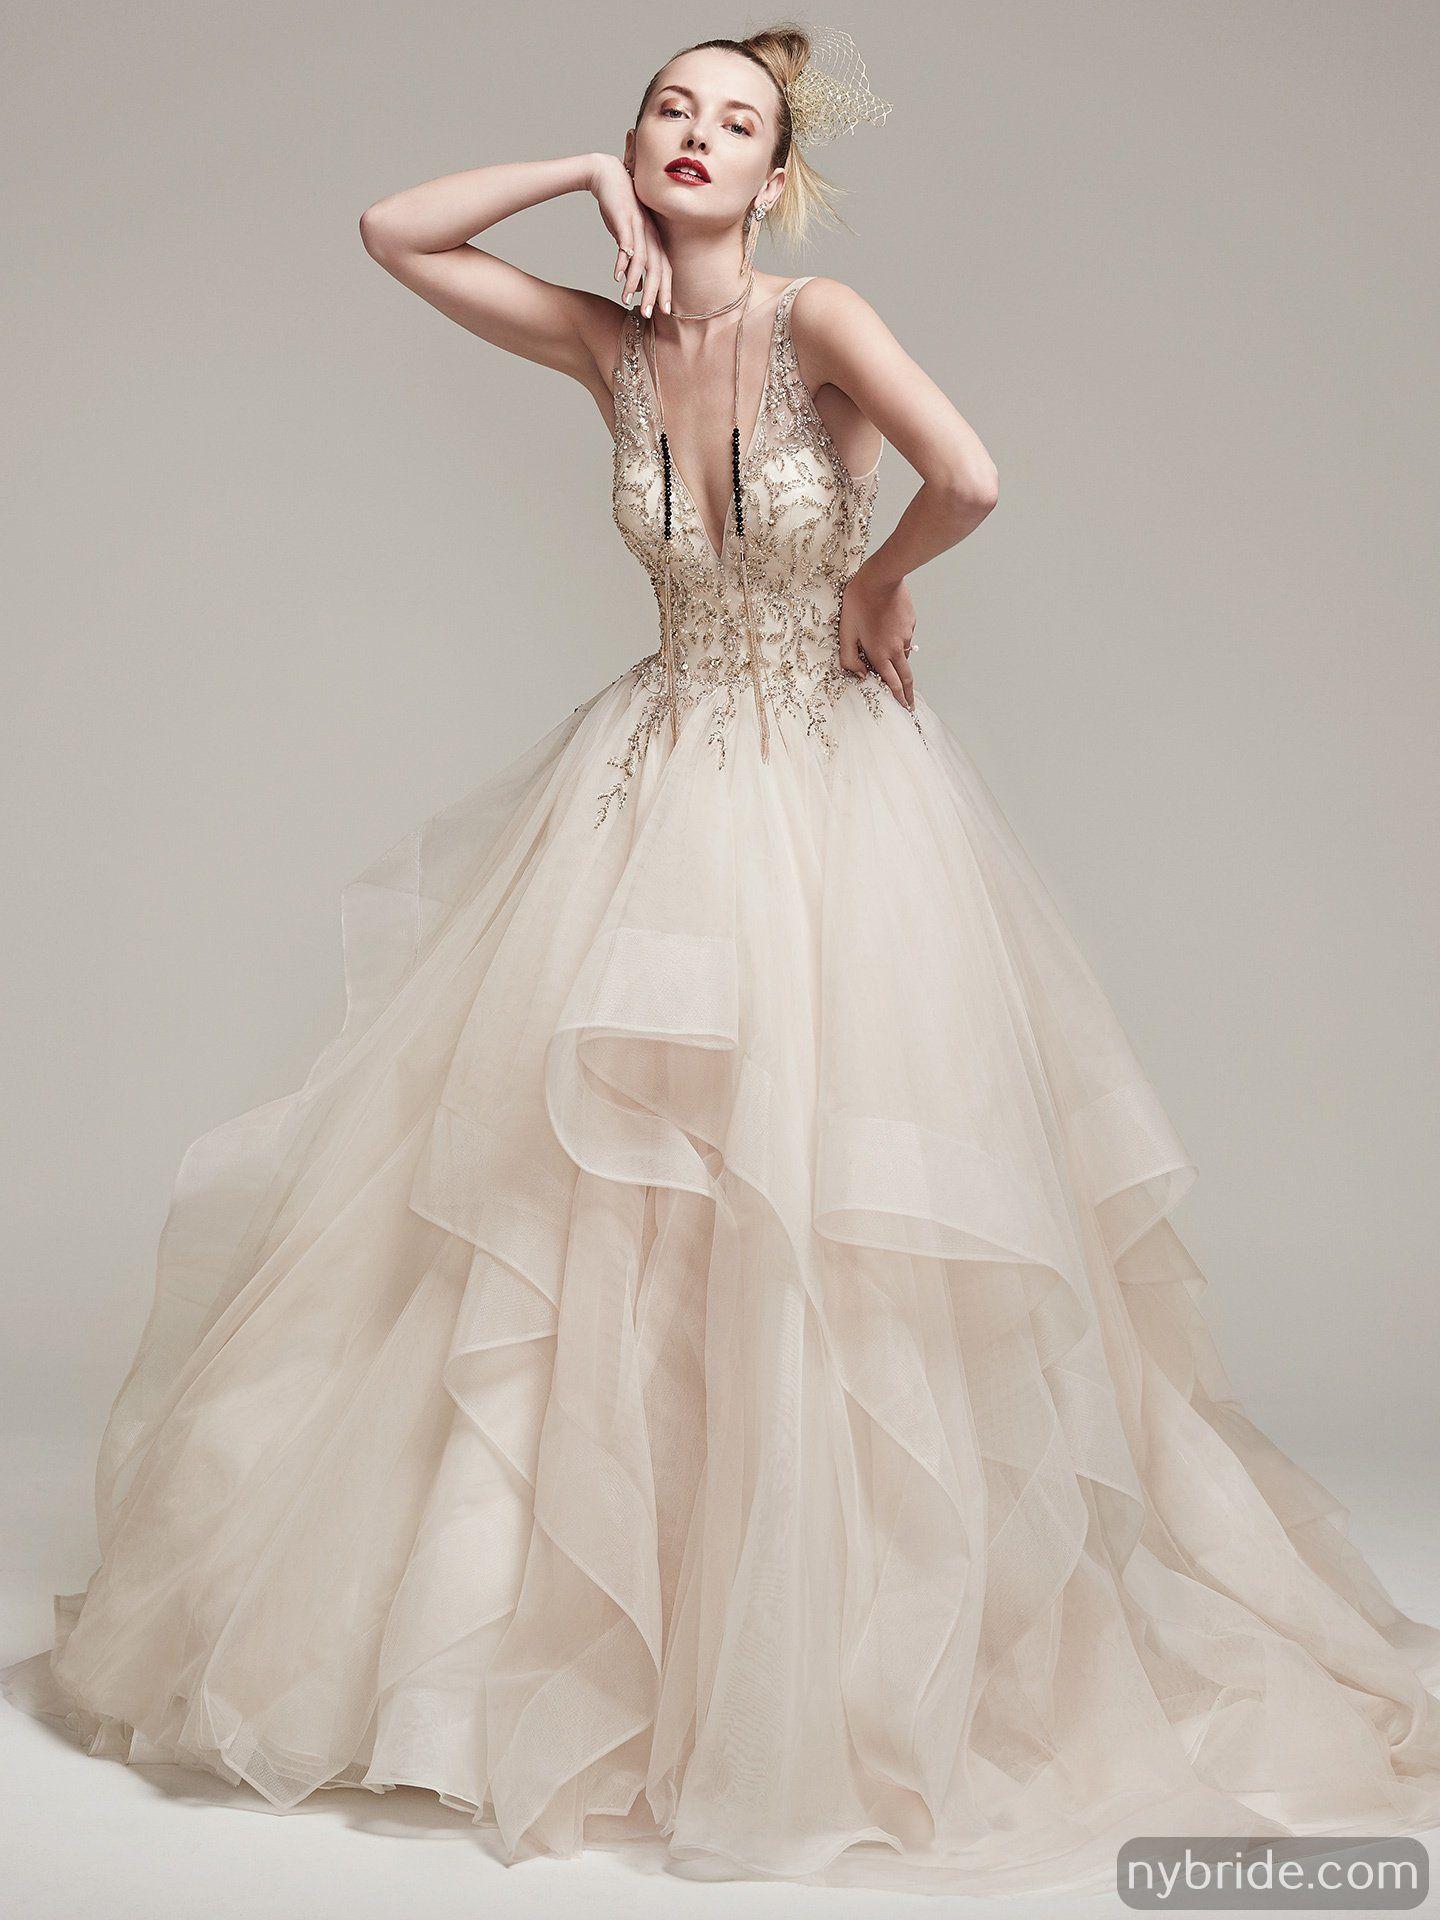 Wedding Dress Shop Ball Gowns Wedding Sottero And Midgley Wedding Dresses Ball Gown Wedding Dress